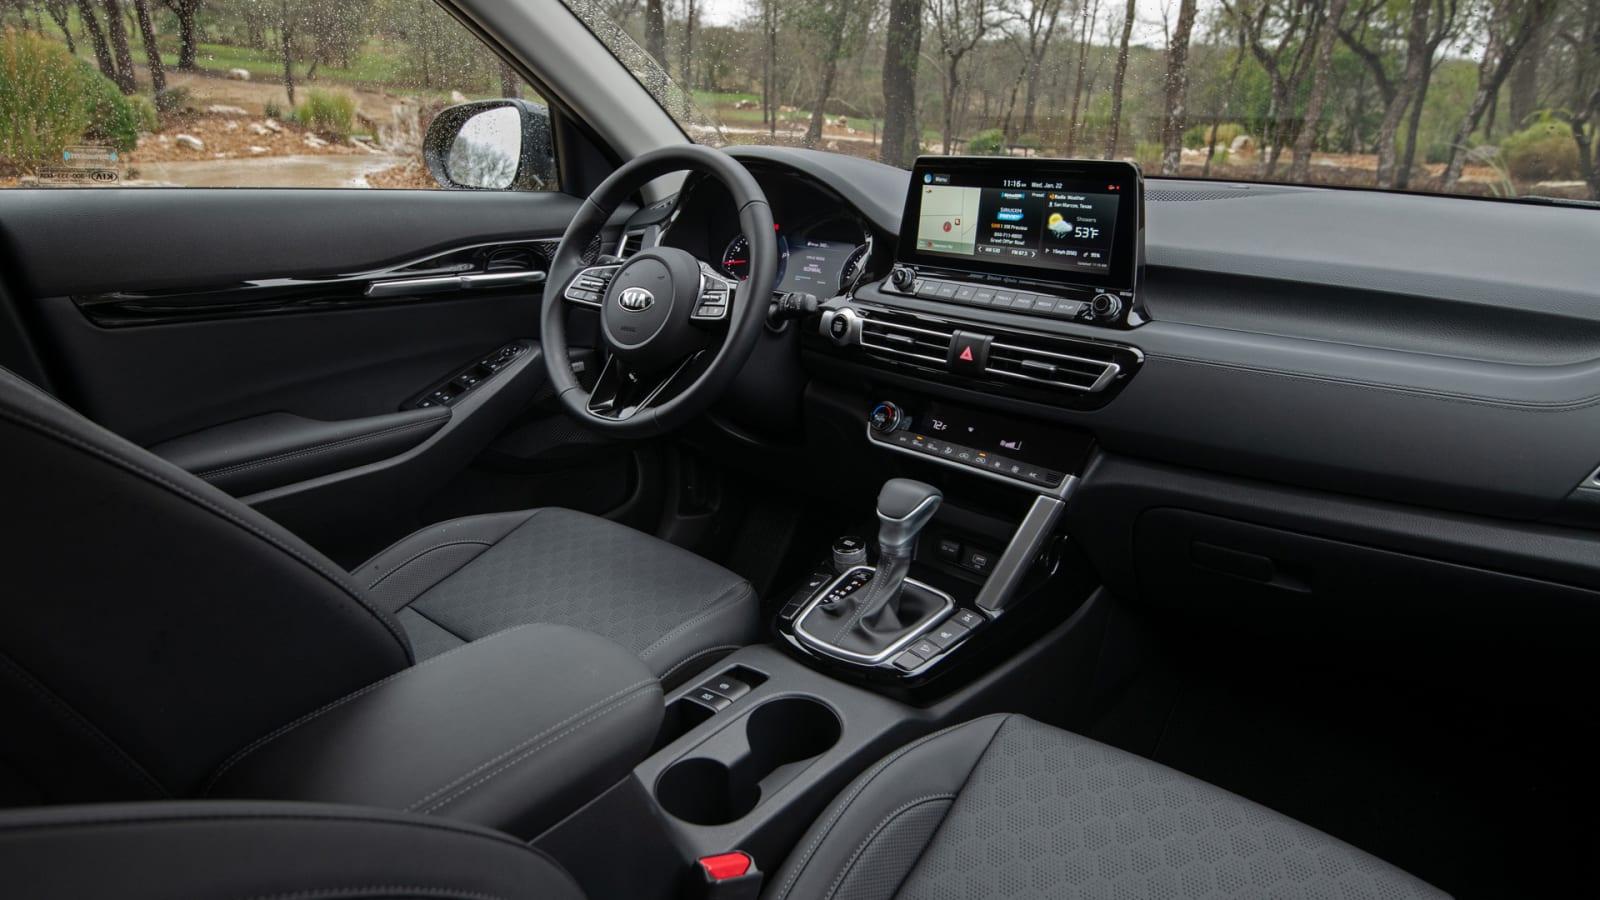 2021 Kia Seltos Review Price Specs Features And Photos Autoblog